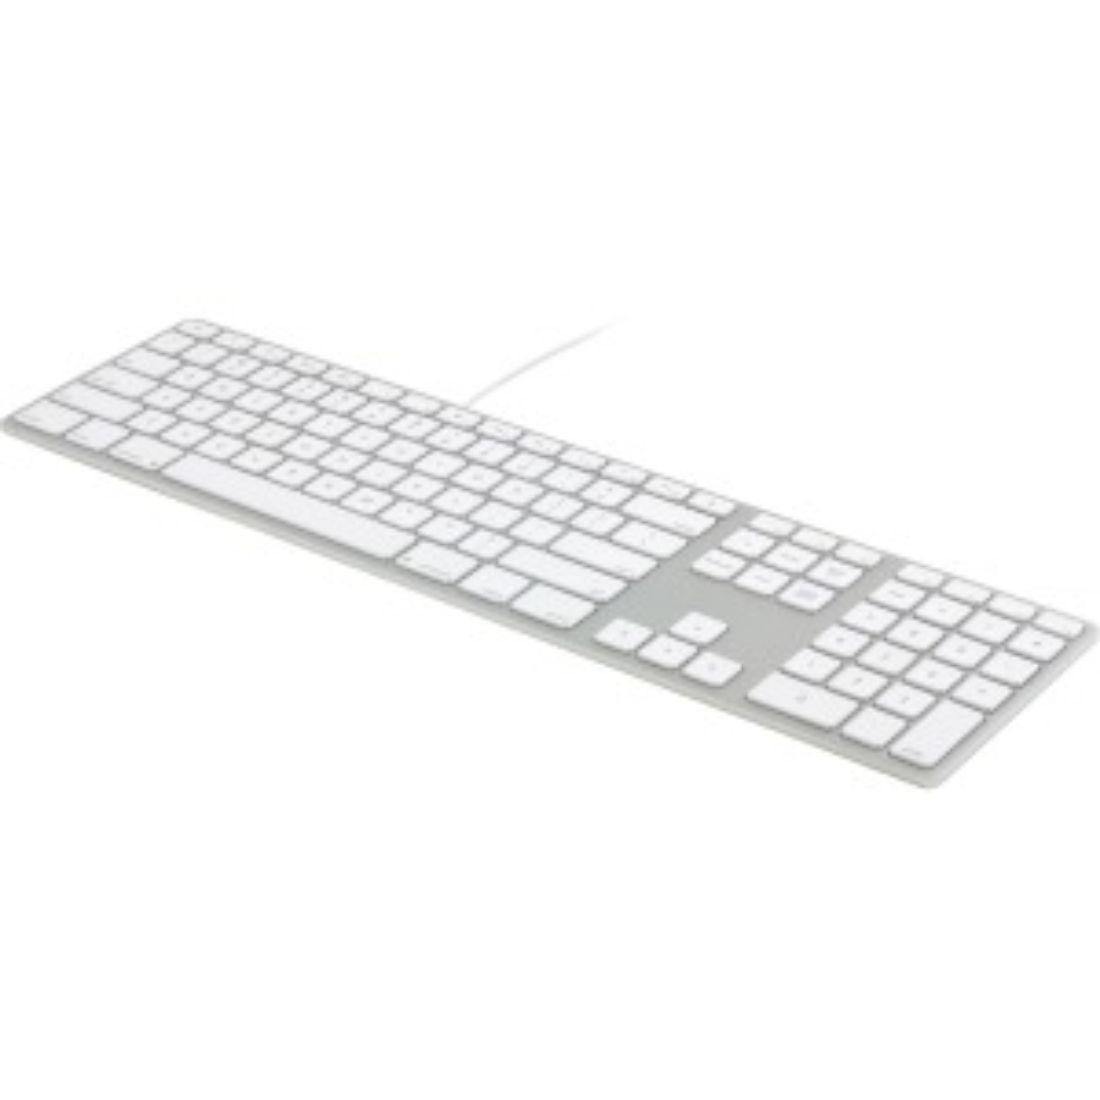 fk318s extended aluminum usb keyboard for mac